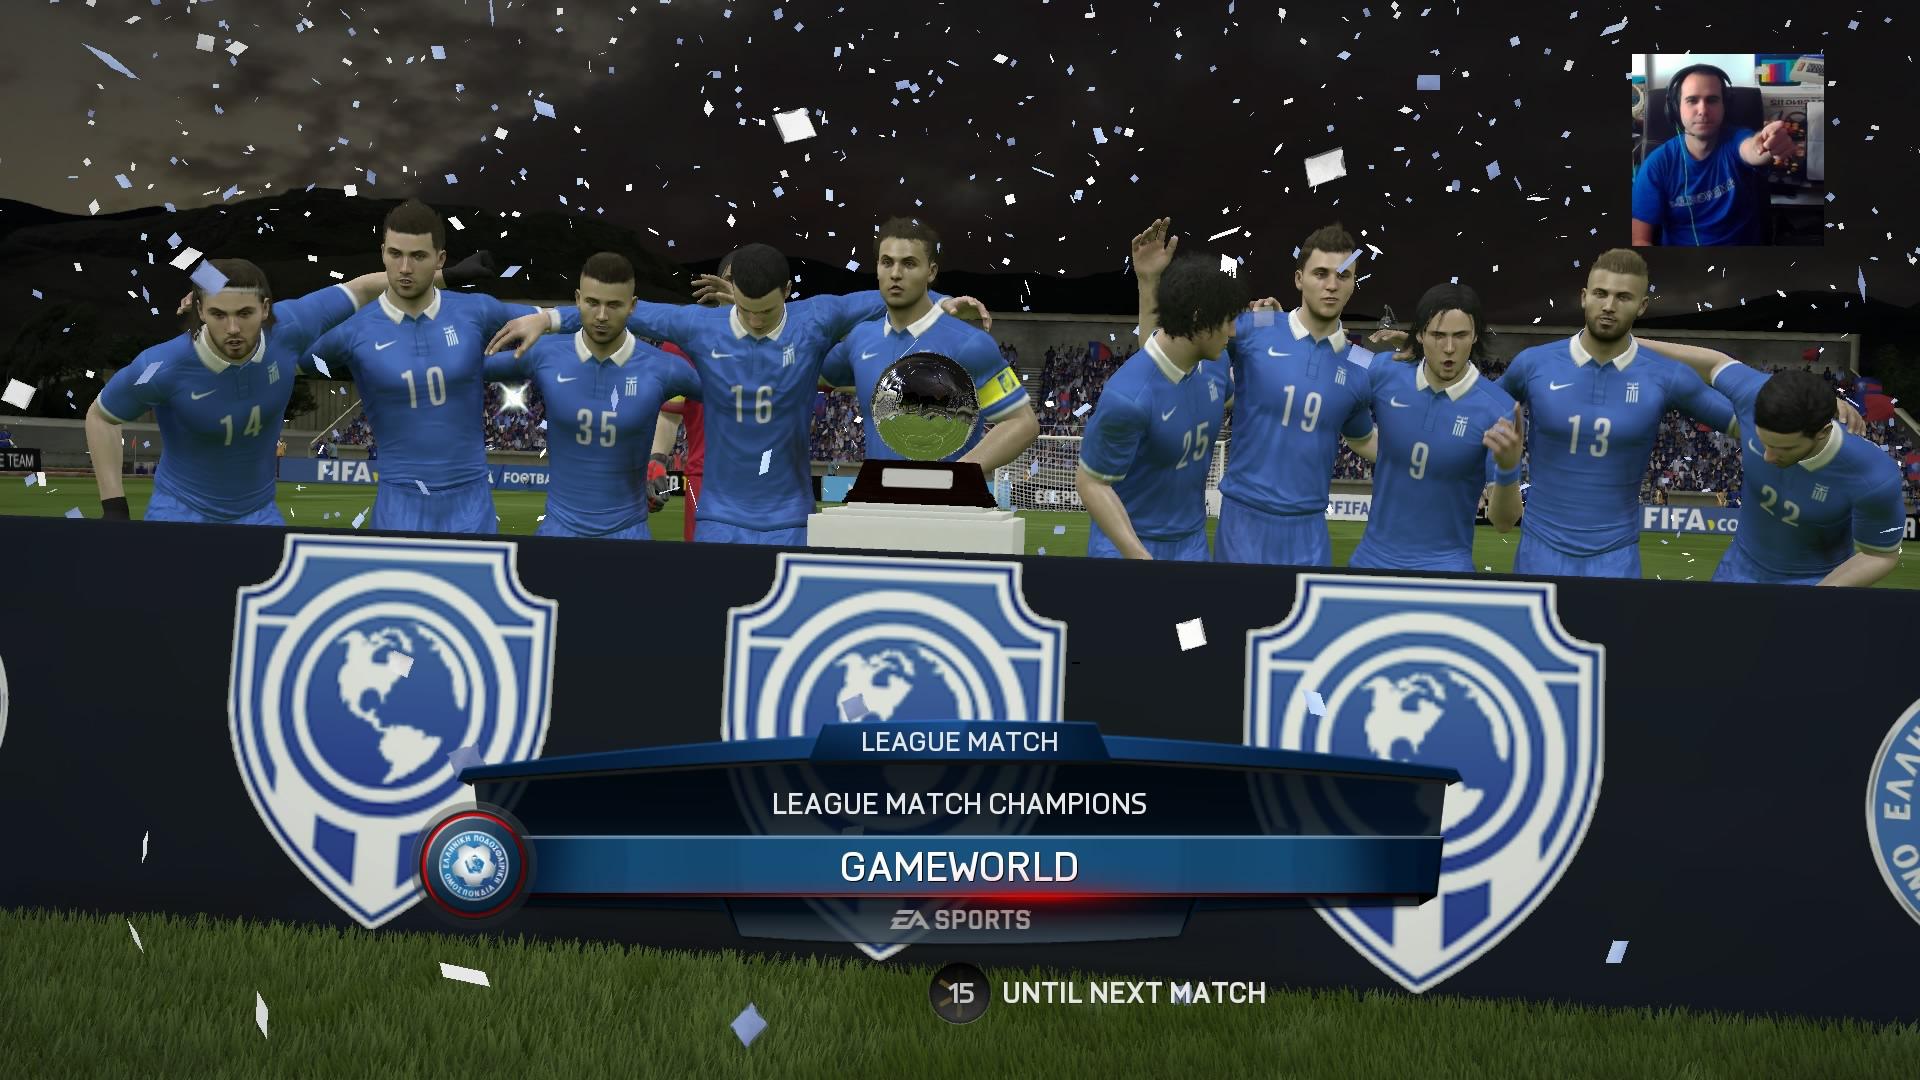 FIFA15ProClubs1-3PSGVGRE,2ndHalf.jpg